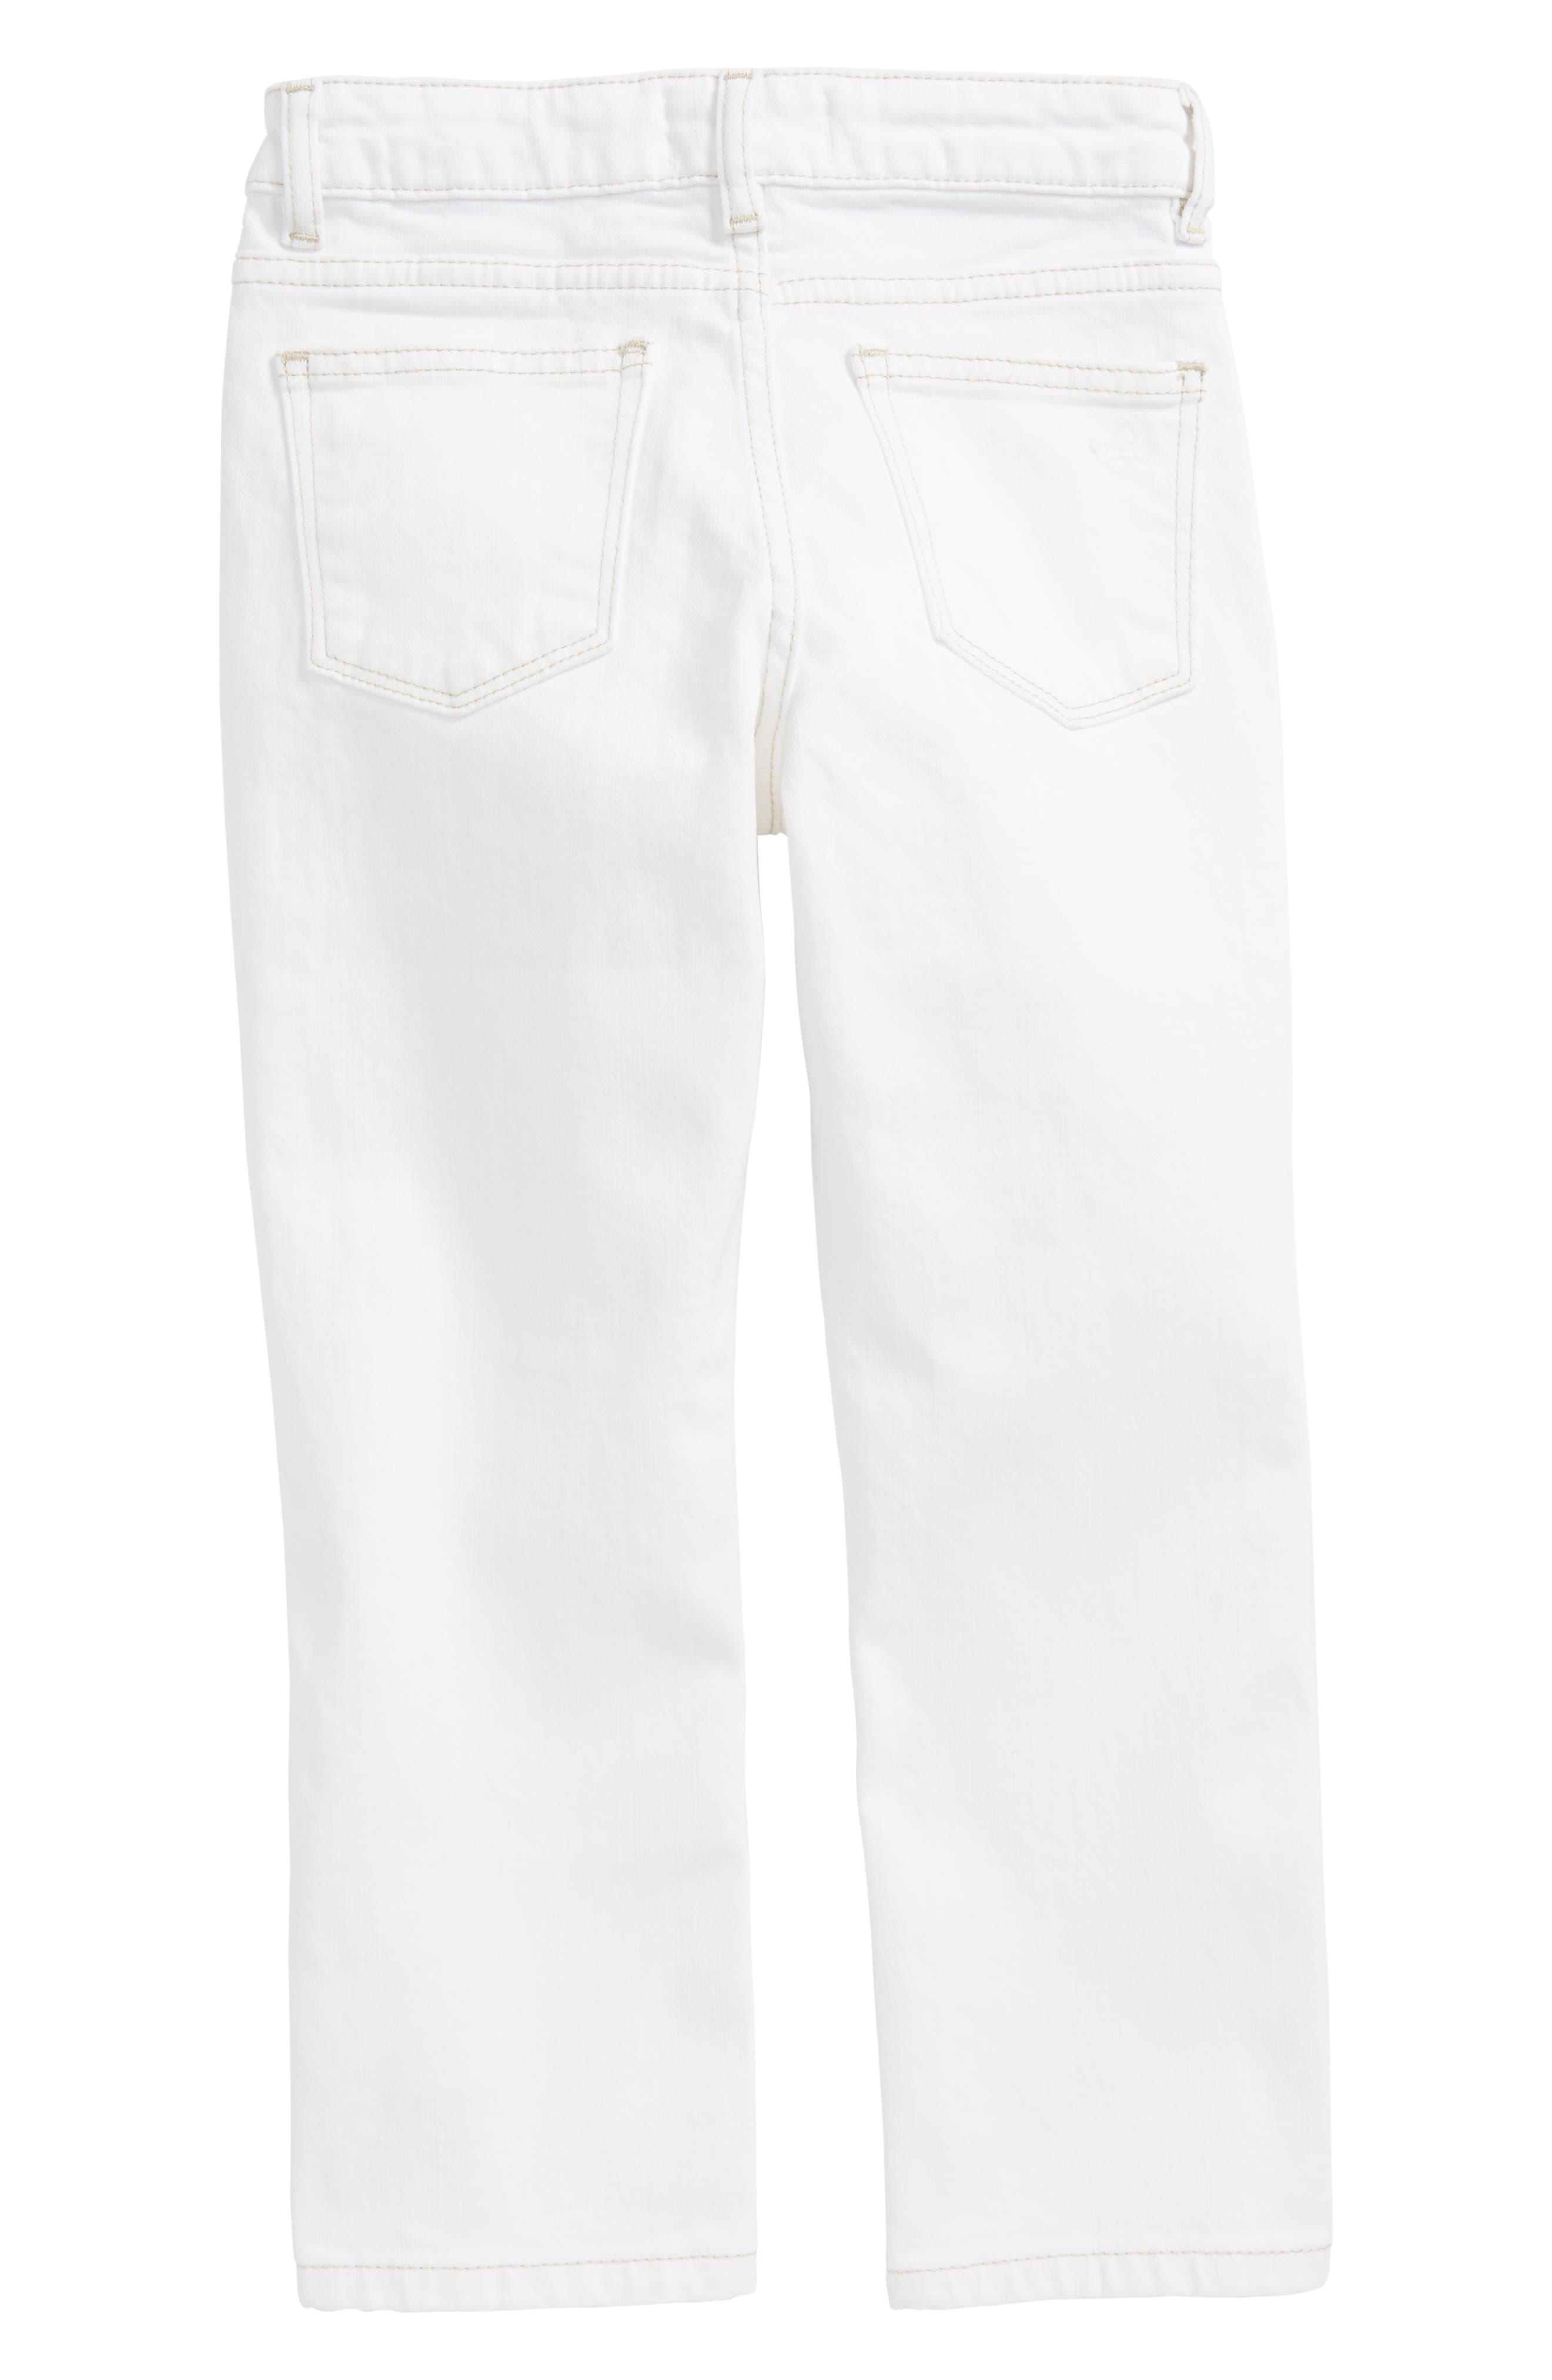 Brady Slim Fit Straight Leg Jeans,                             Alternate thumbnail 2, color,                             100